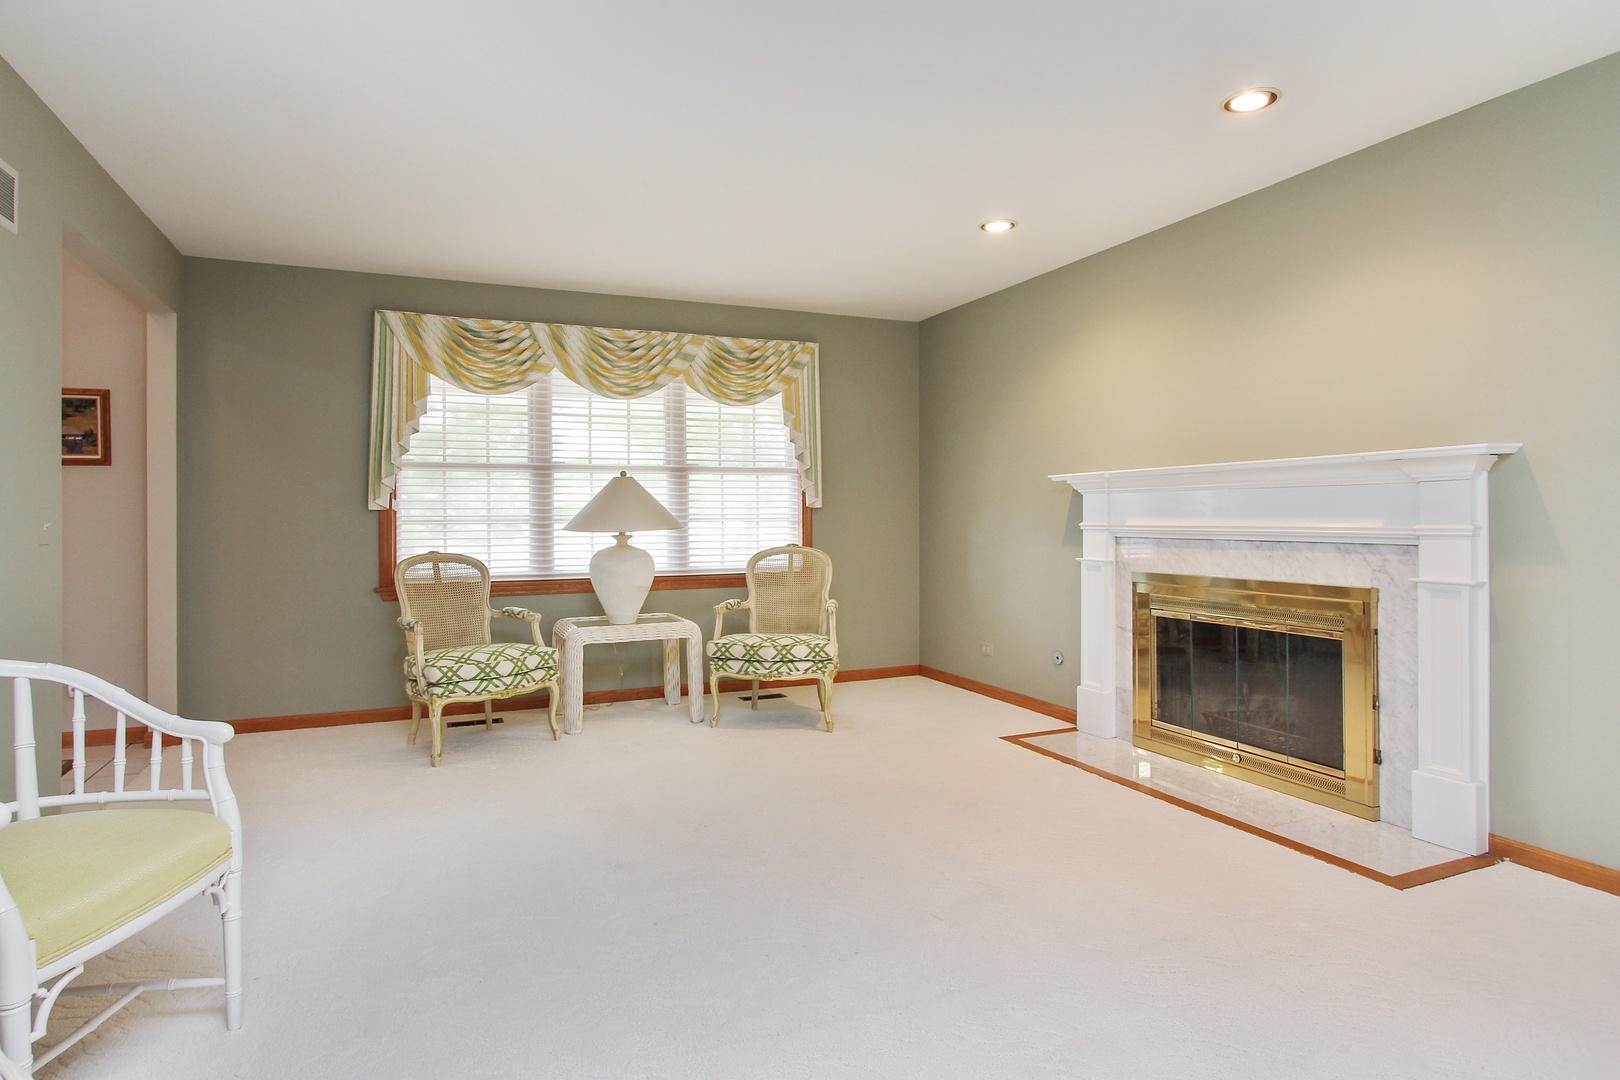 14 Lancelot Lane, Hawthorn Woods, IL, 60047 | Prime Real Estate ...